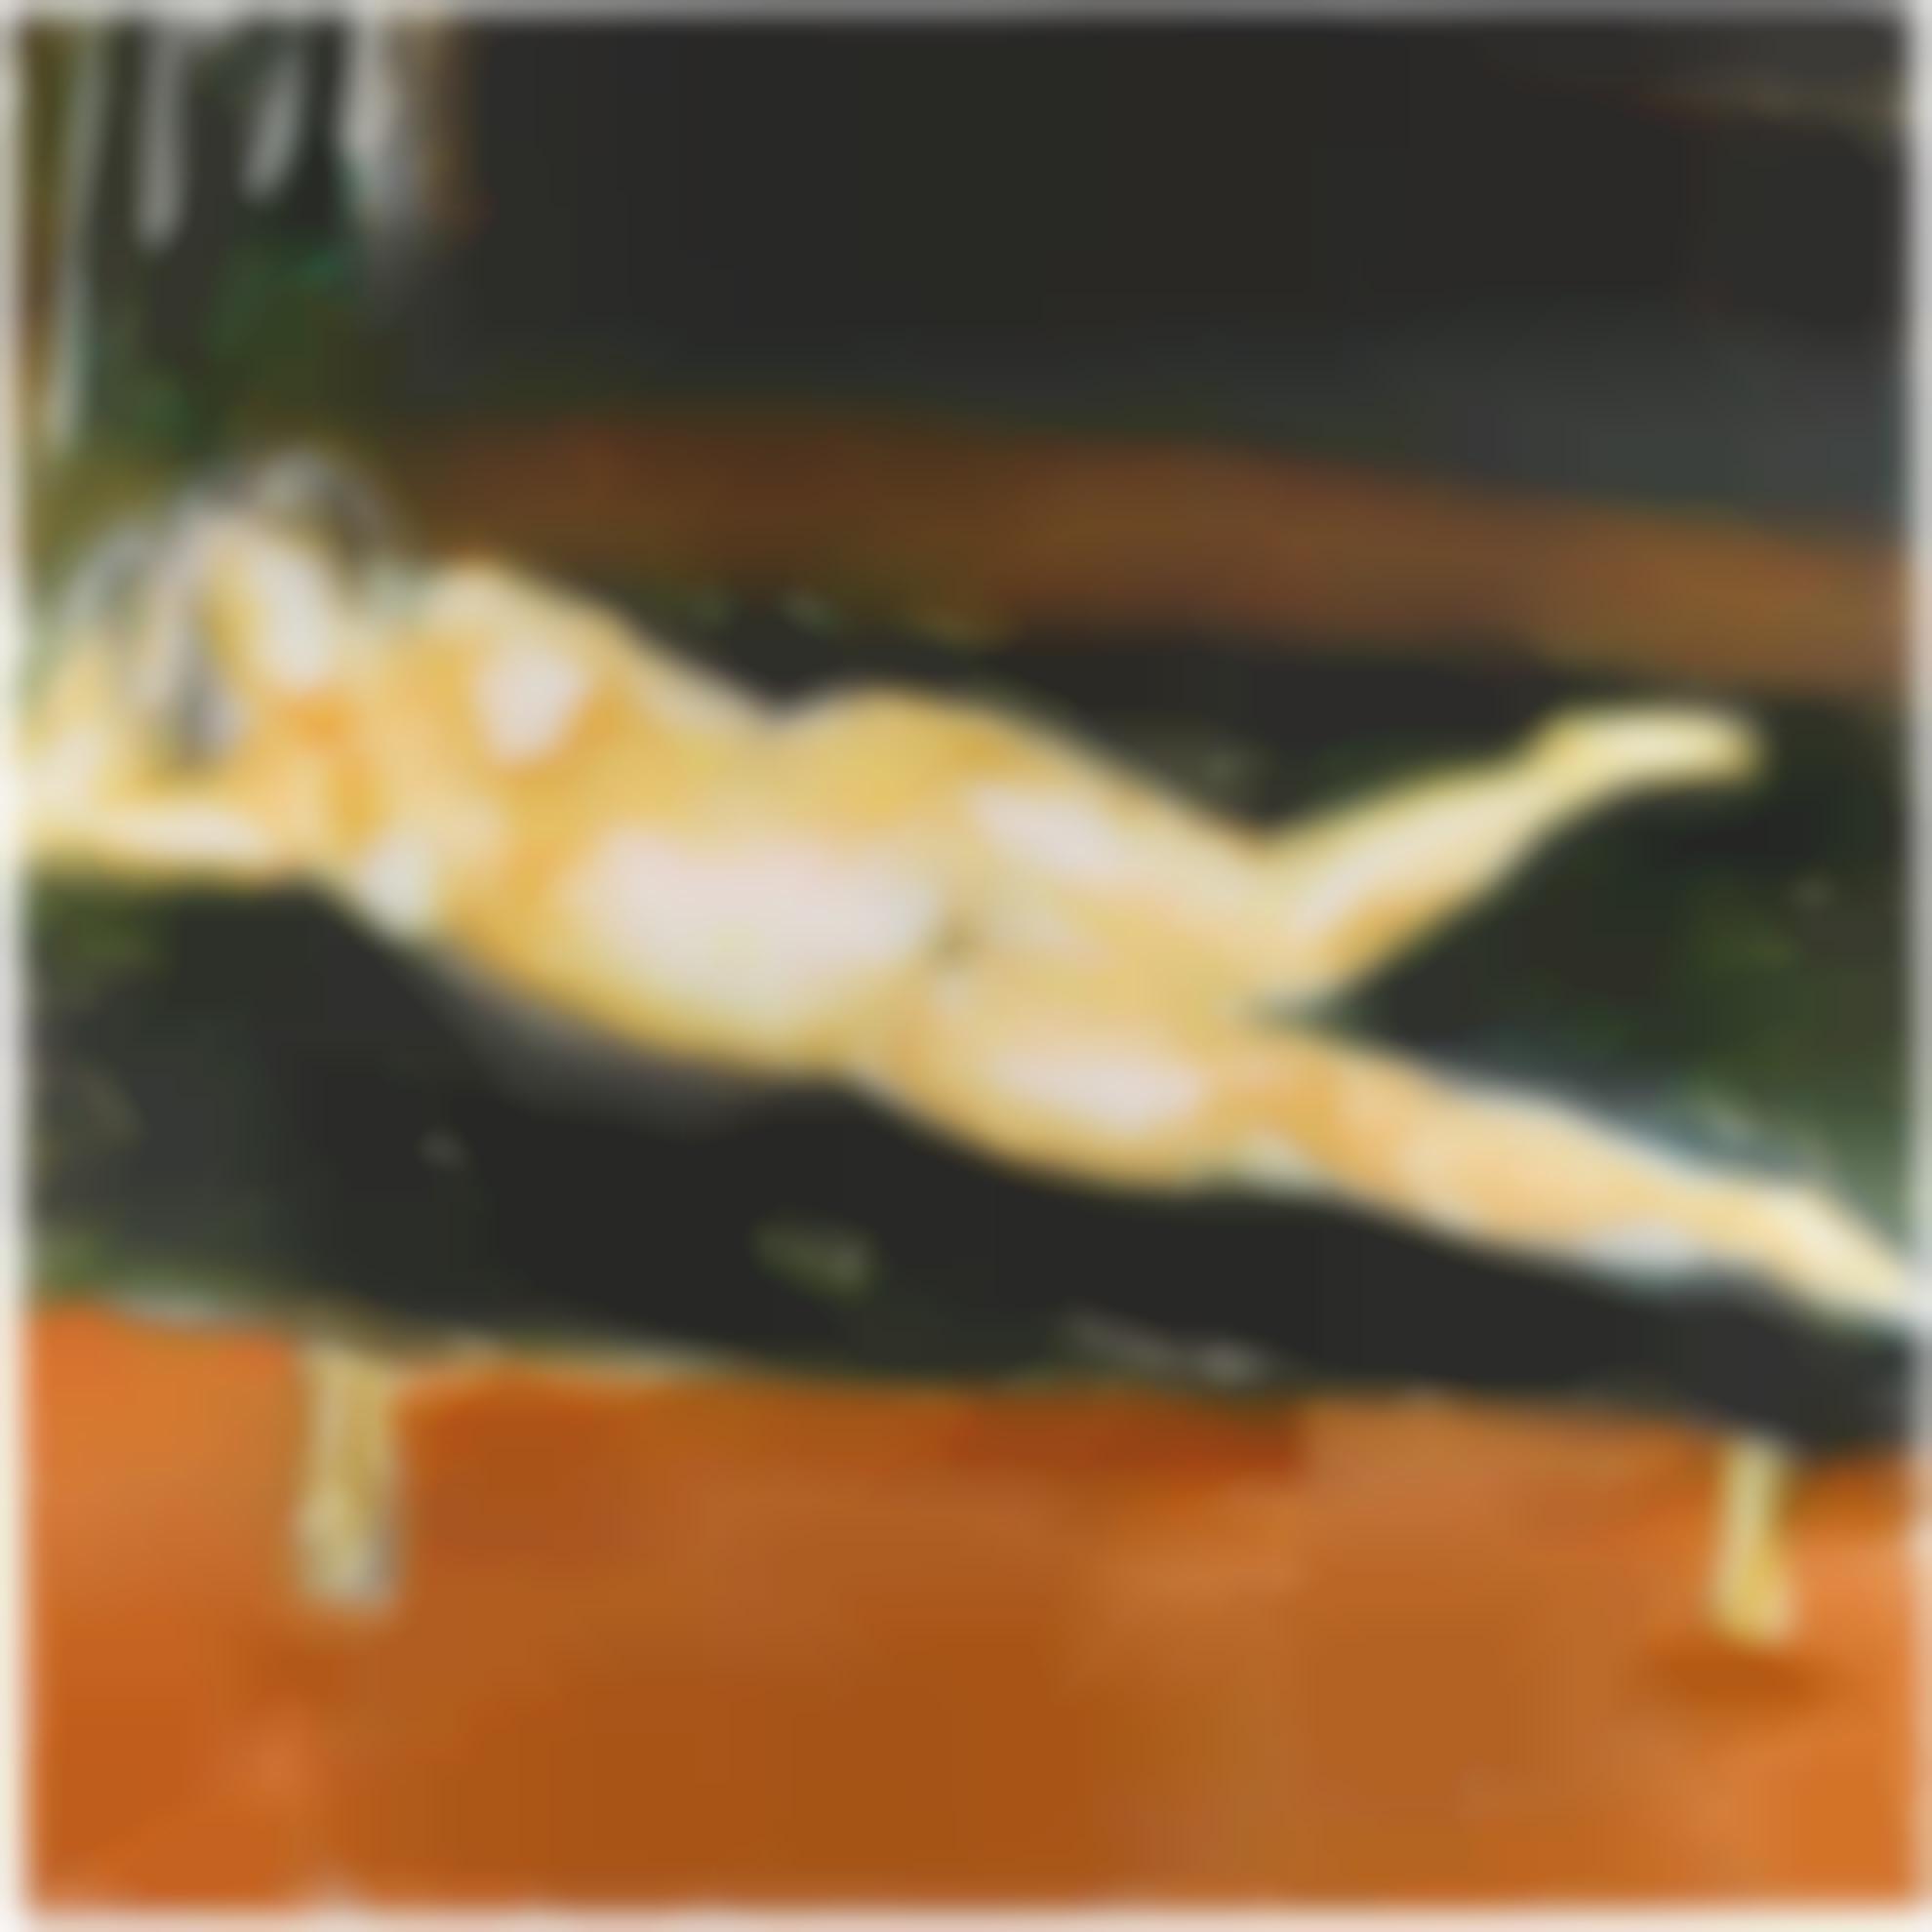 Barrie Cooke - Long Nude-2006